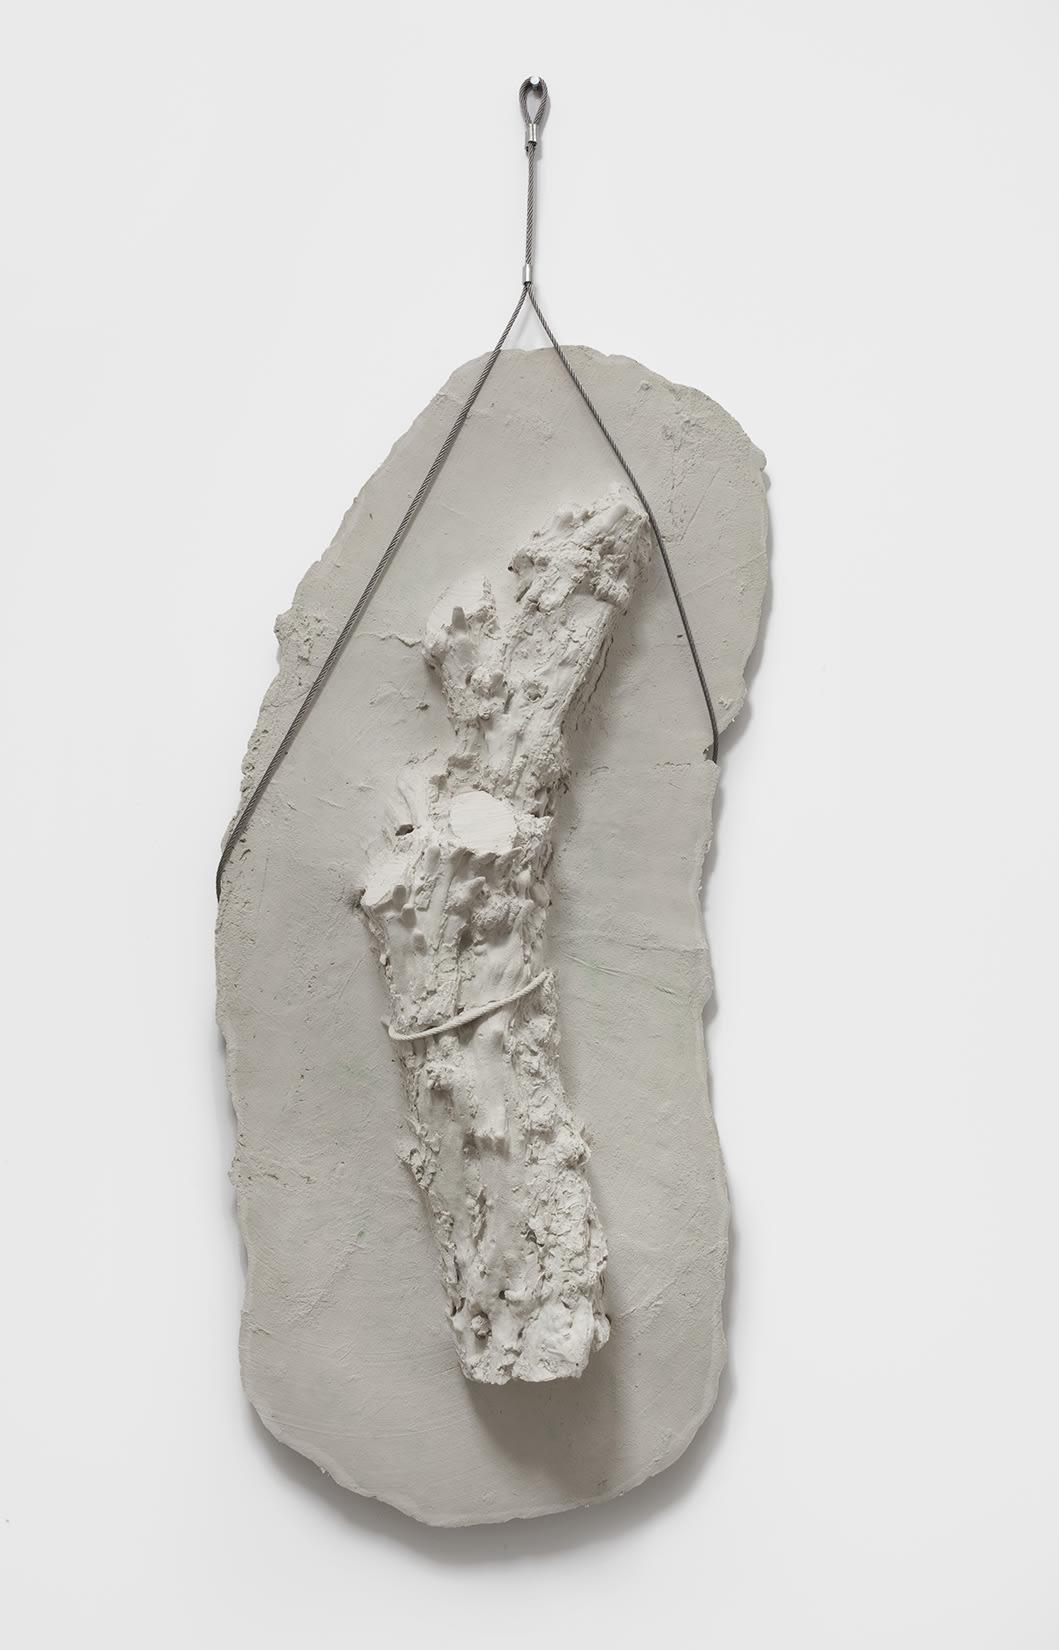 Giuseppe Penone, Germinazione (Germination), 2005